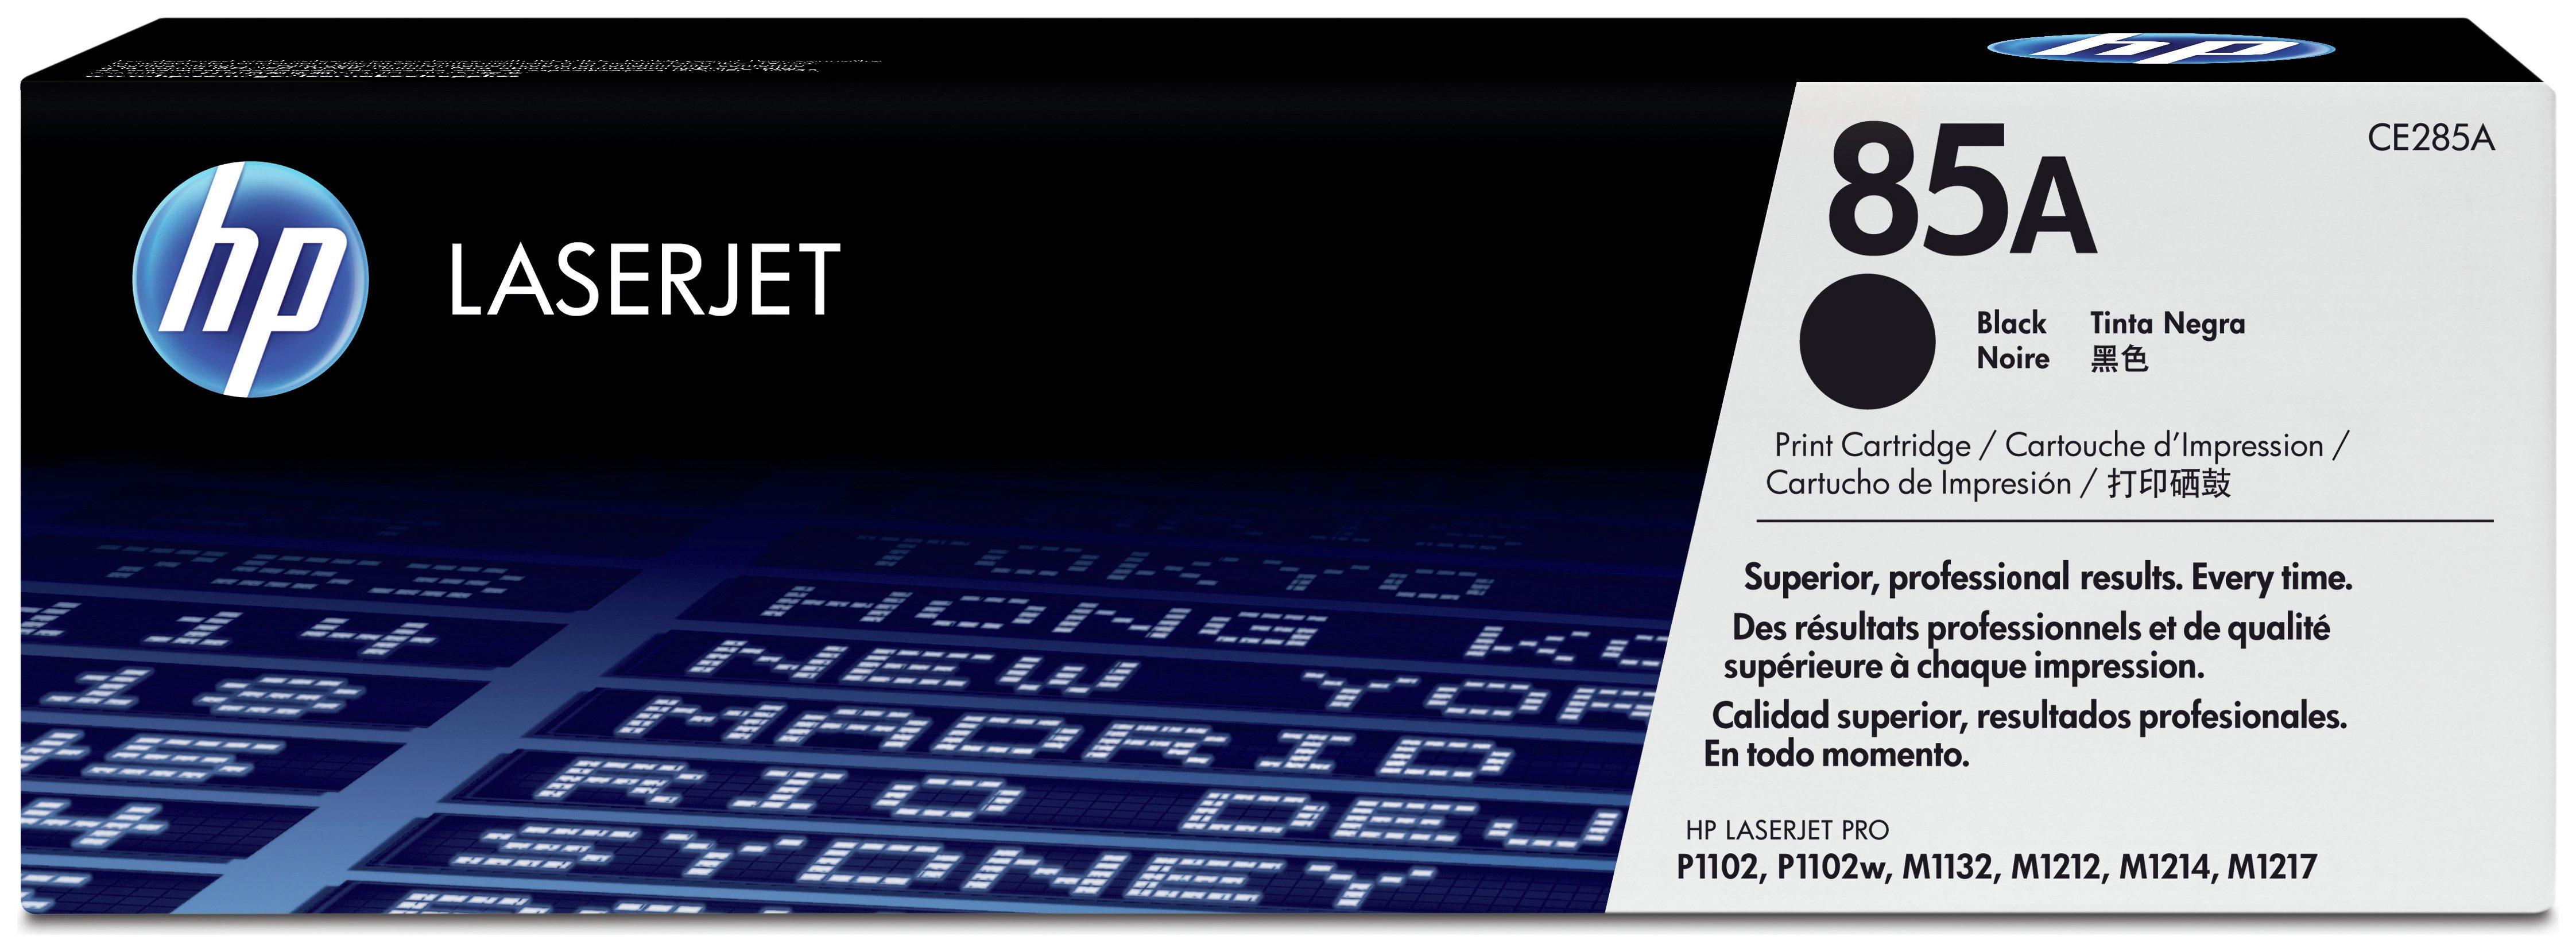 HP - 85A Black LaserJet - Toner Cartridge (CE285A)